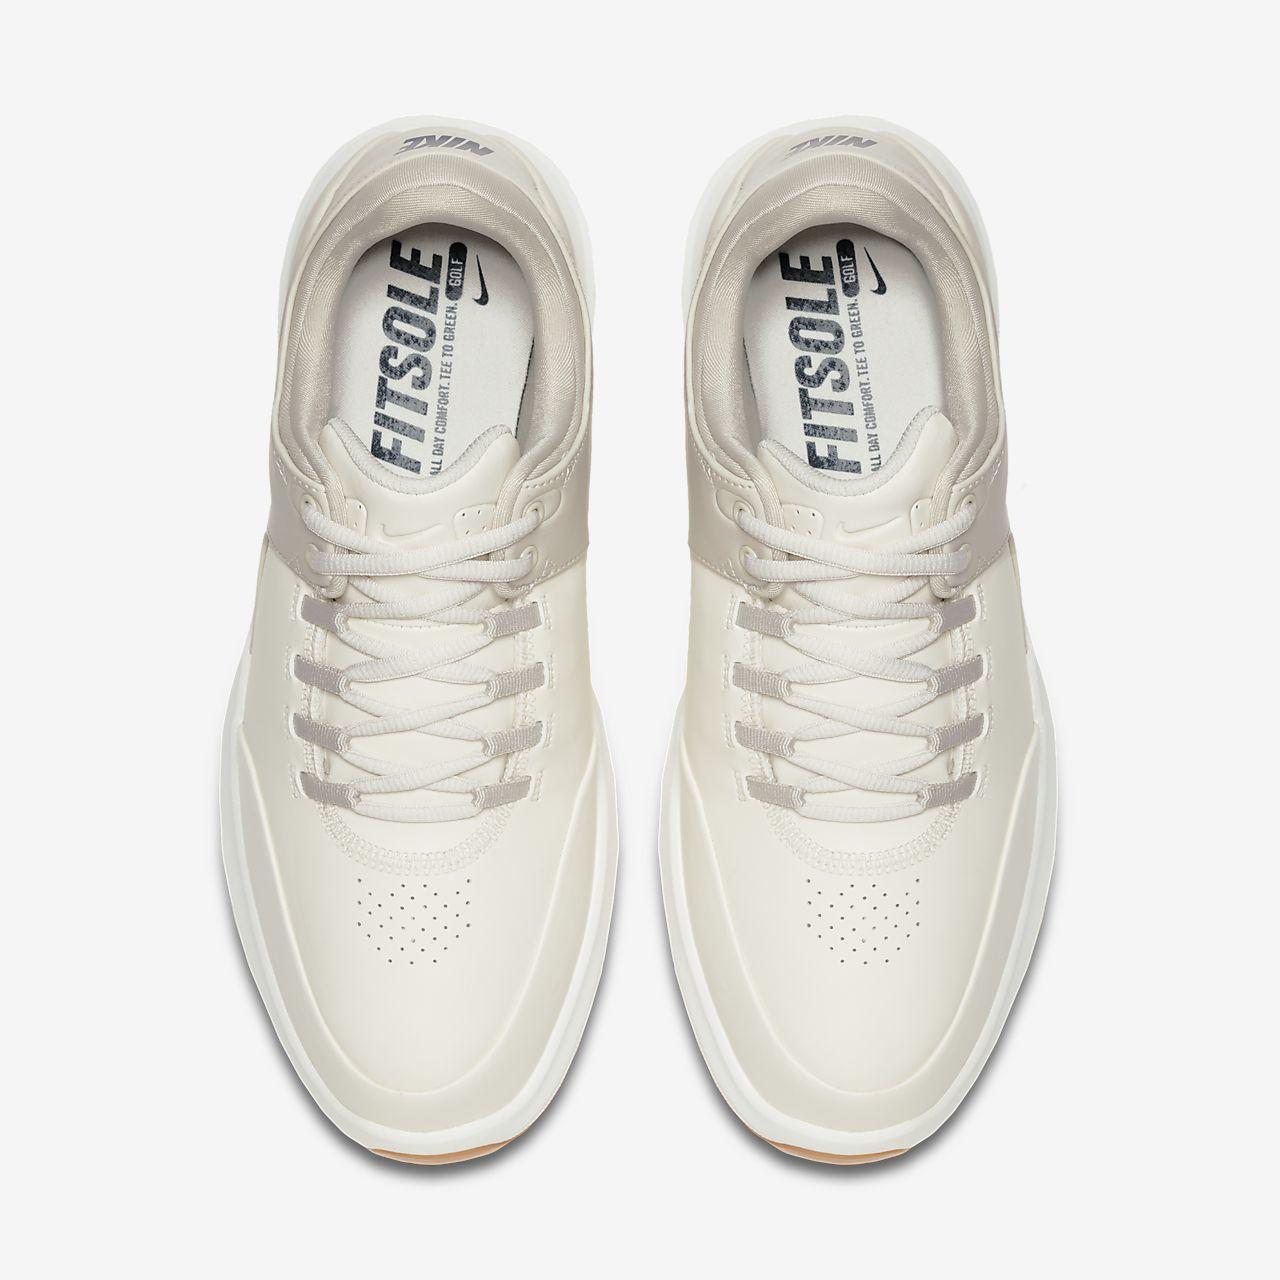 89a5ffeb0a1c Nike Air Zoom Accurate Men s Golf Shoe. Nike.com BE